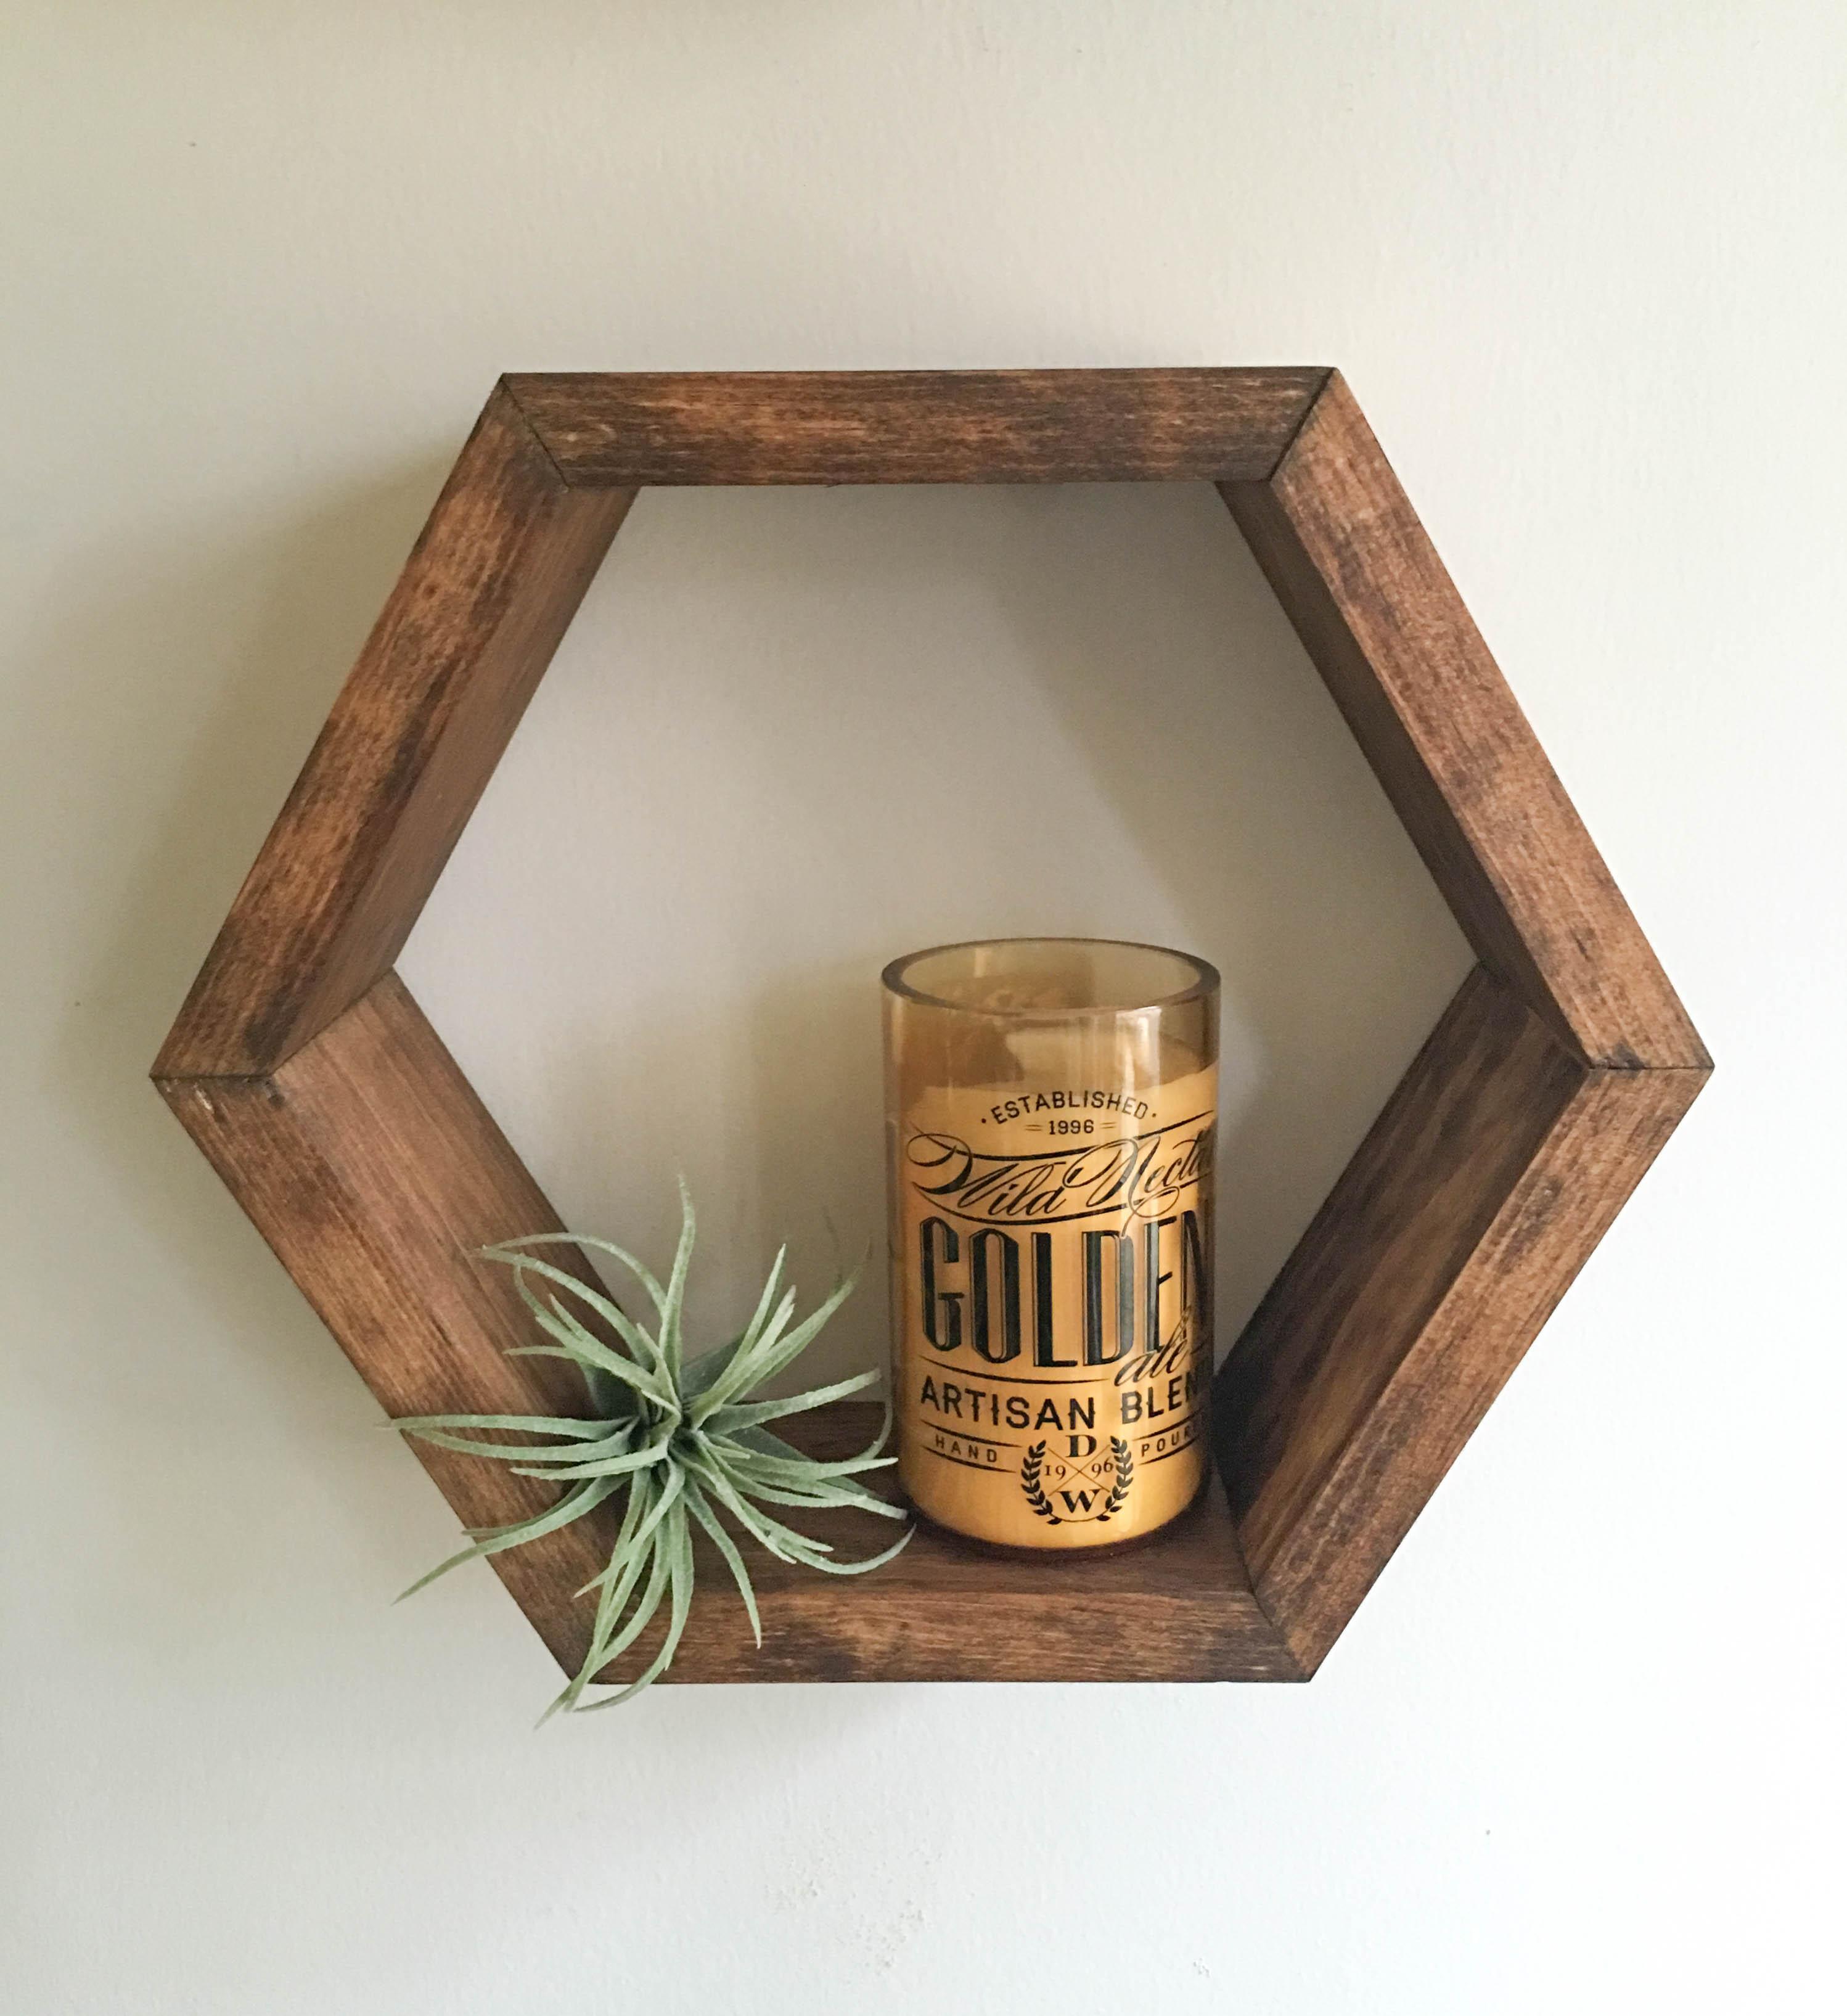 Green Shelves Canisters Diy Island Wood Nailed To: Honeycomb Shelf